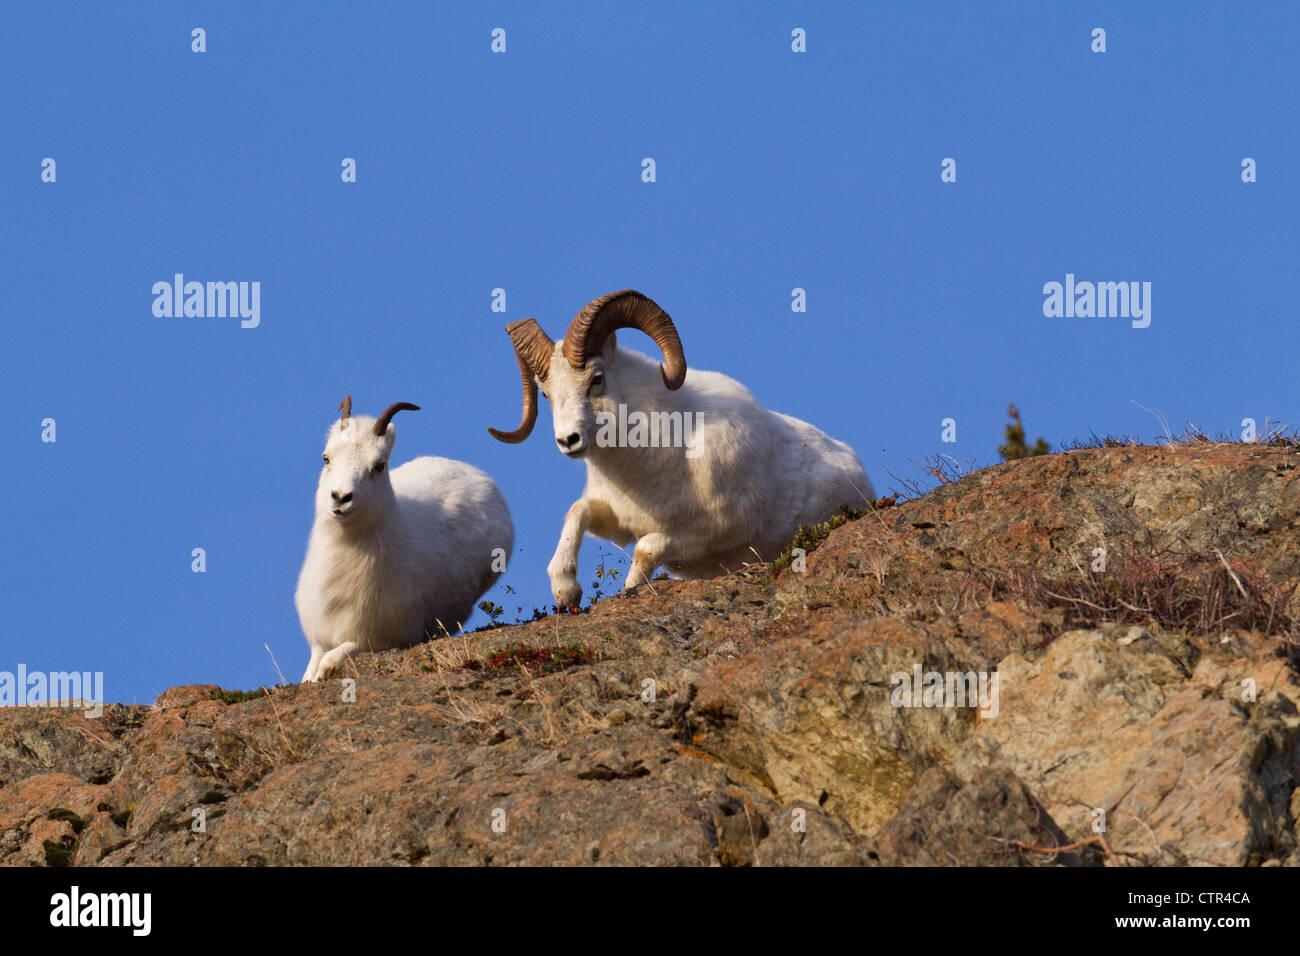 Chases Stockfotos & Chases Bilder - Alamy